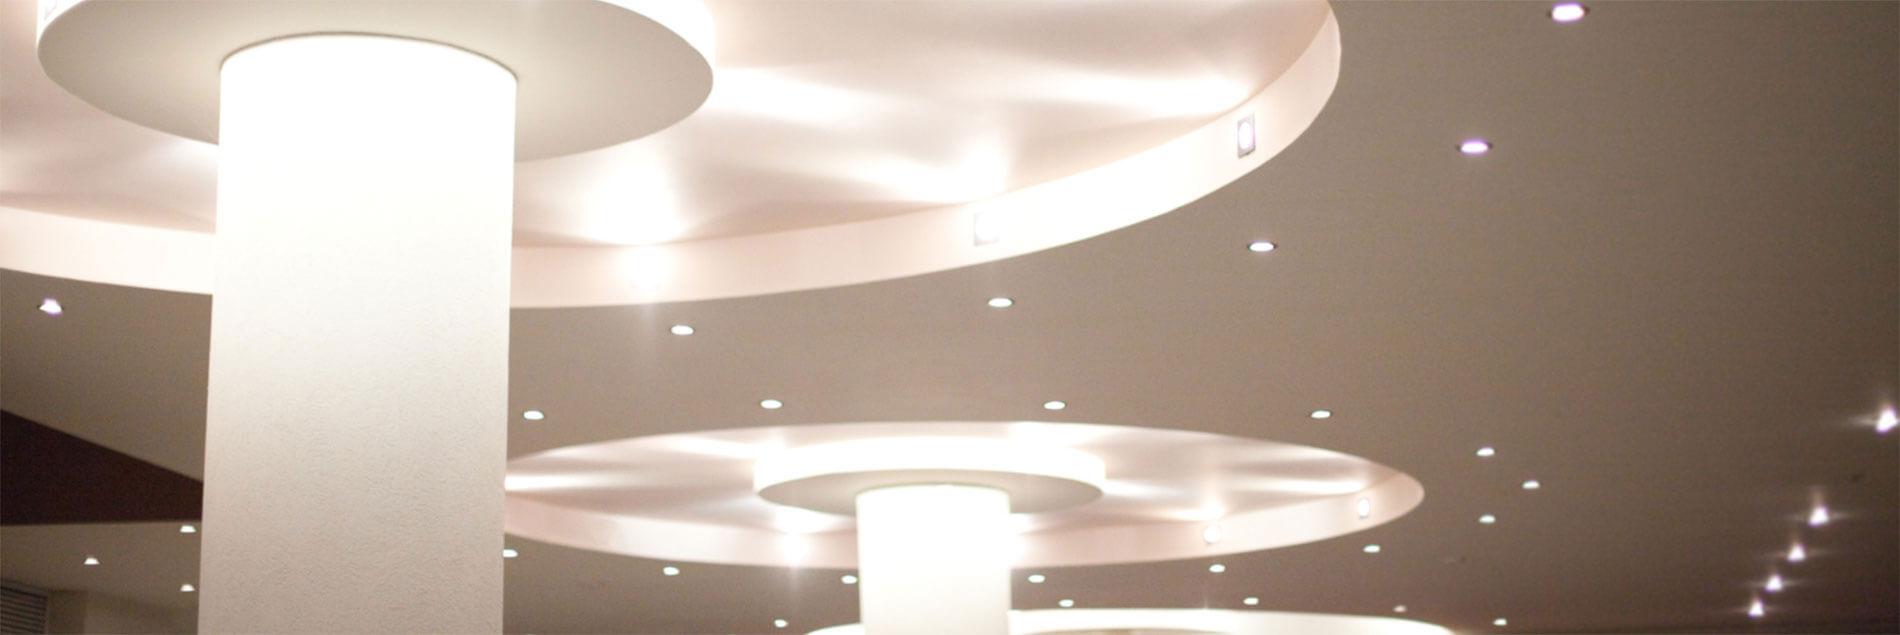 Yela lighting slider home kantoorverlichting LED